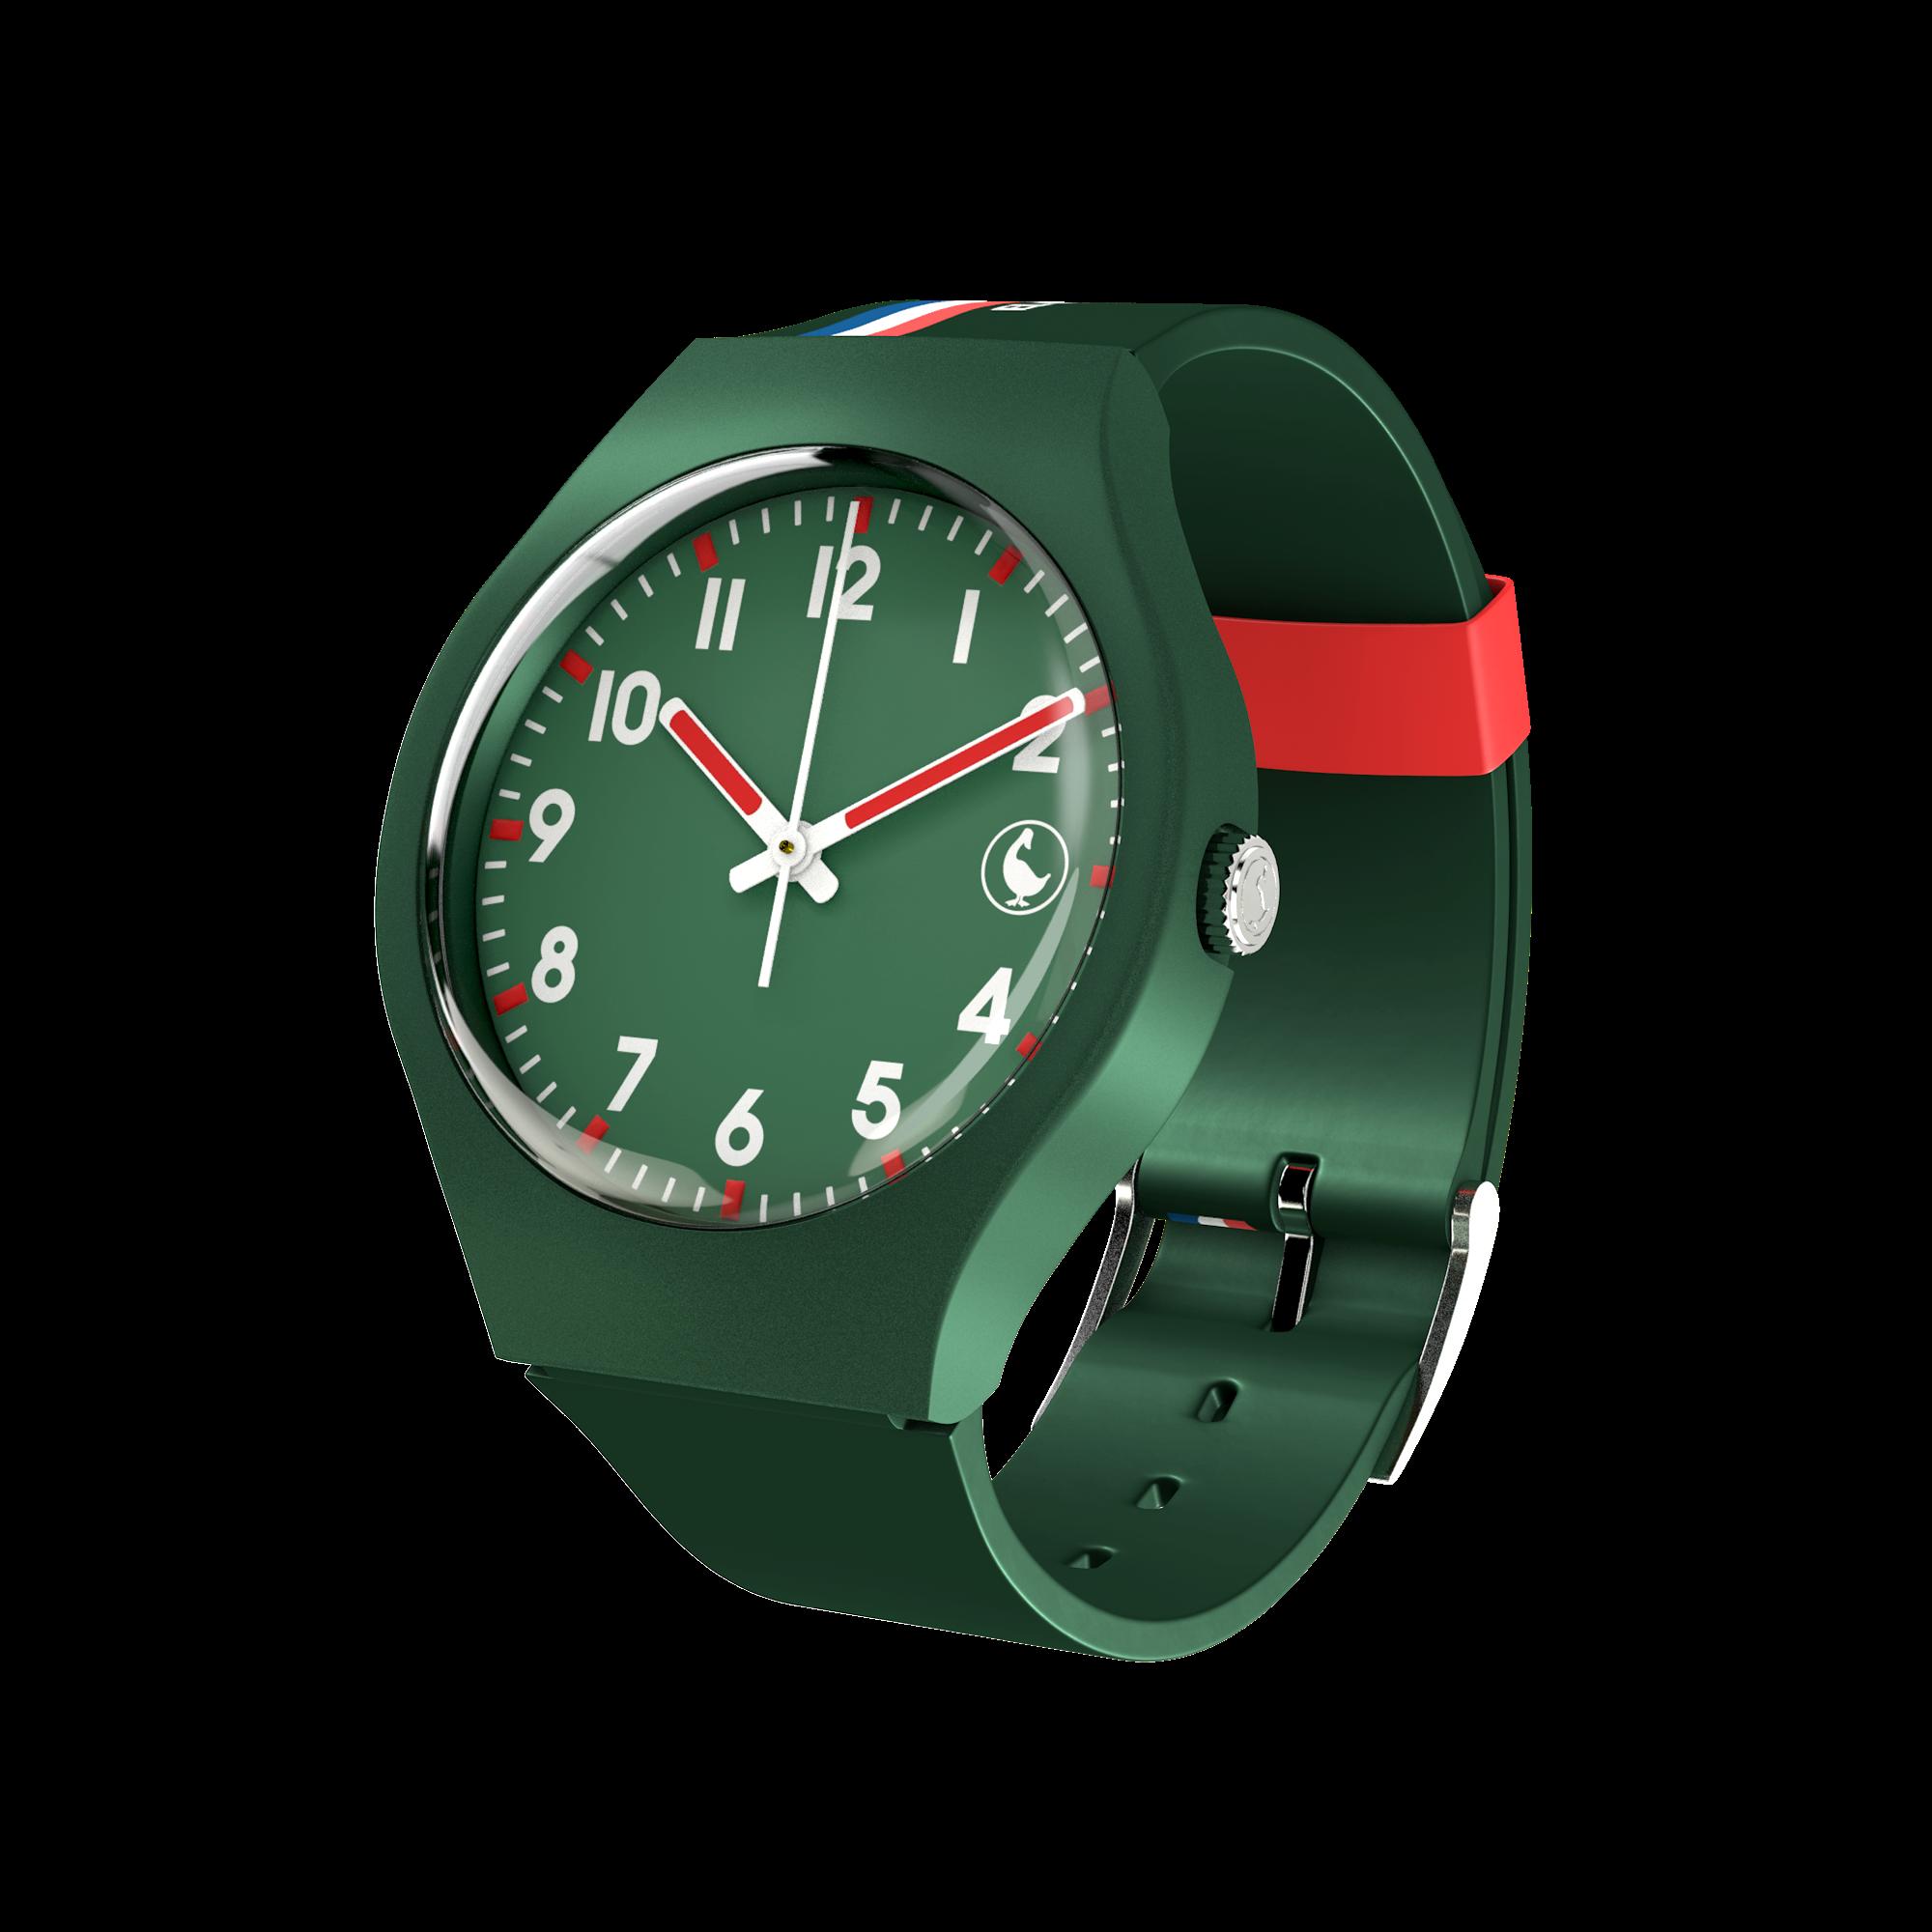 Reloj El Ganso Green Image 2